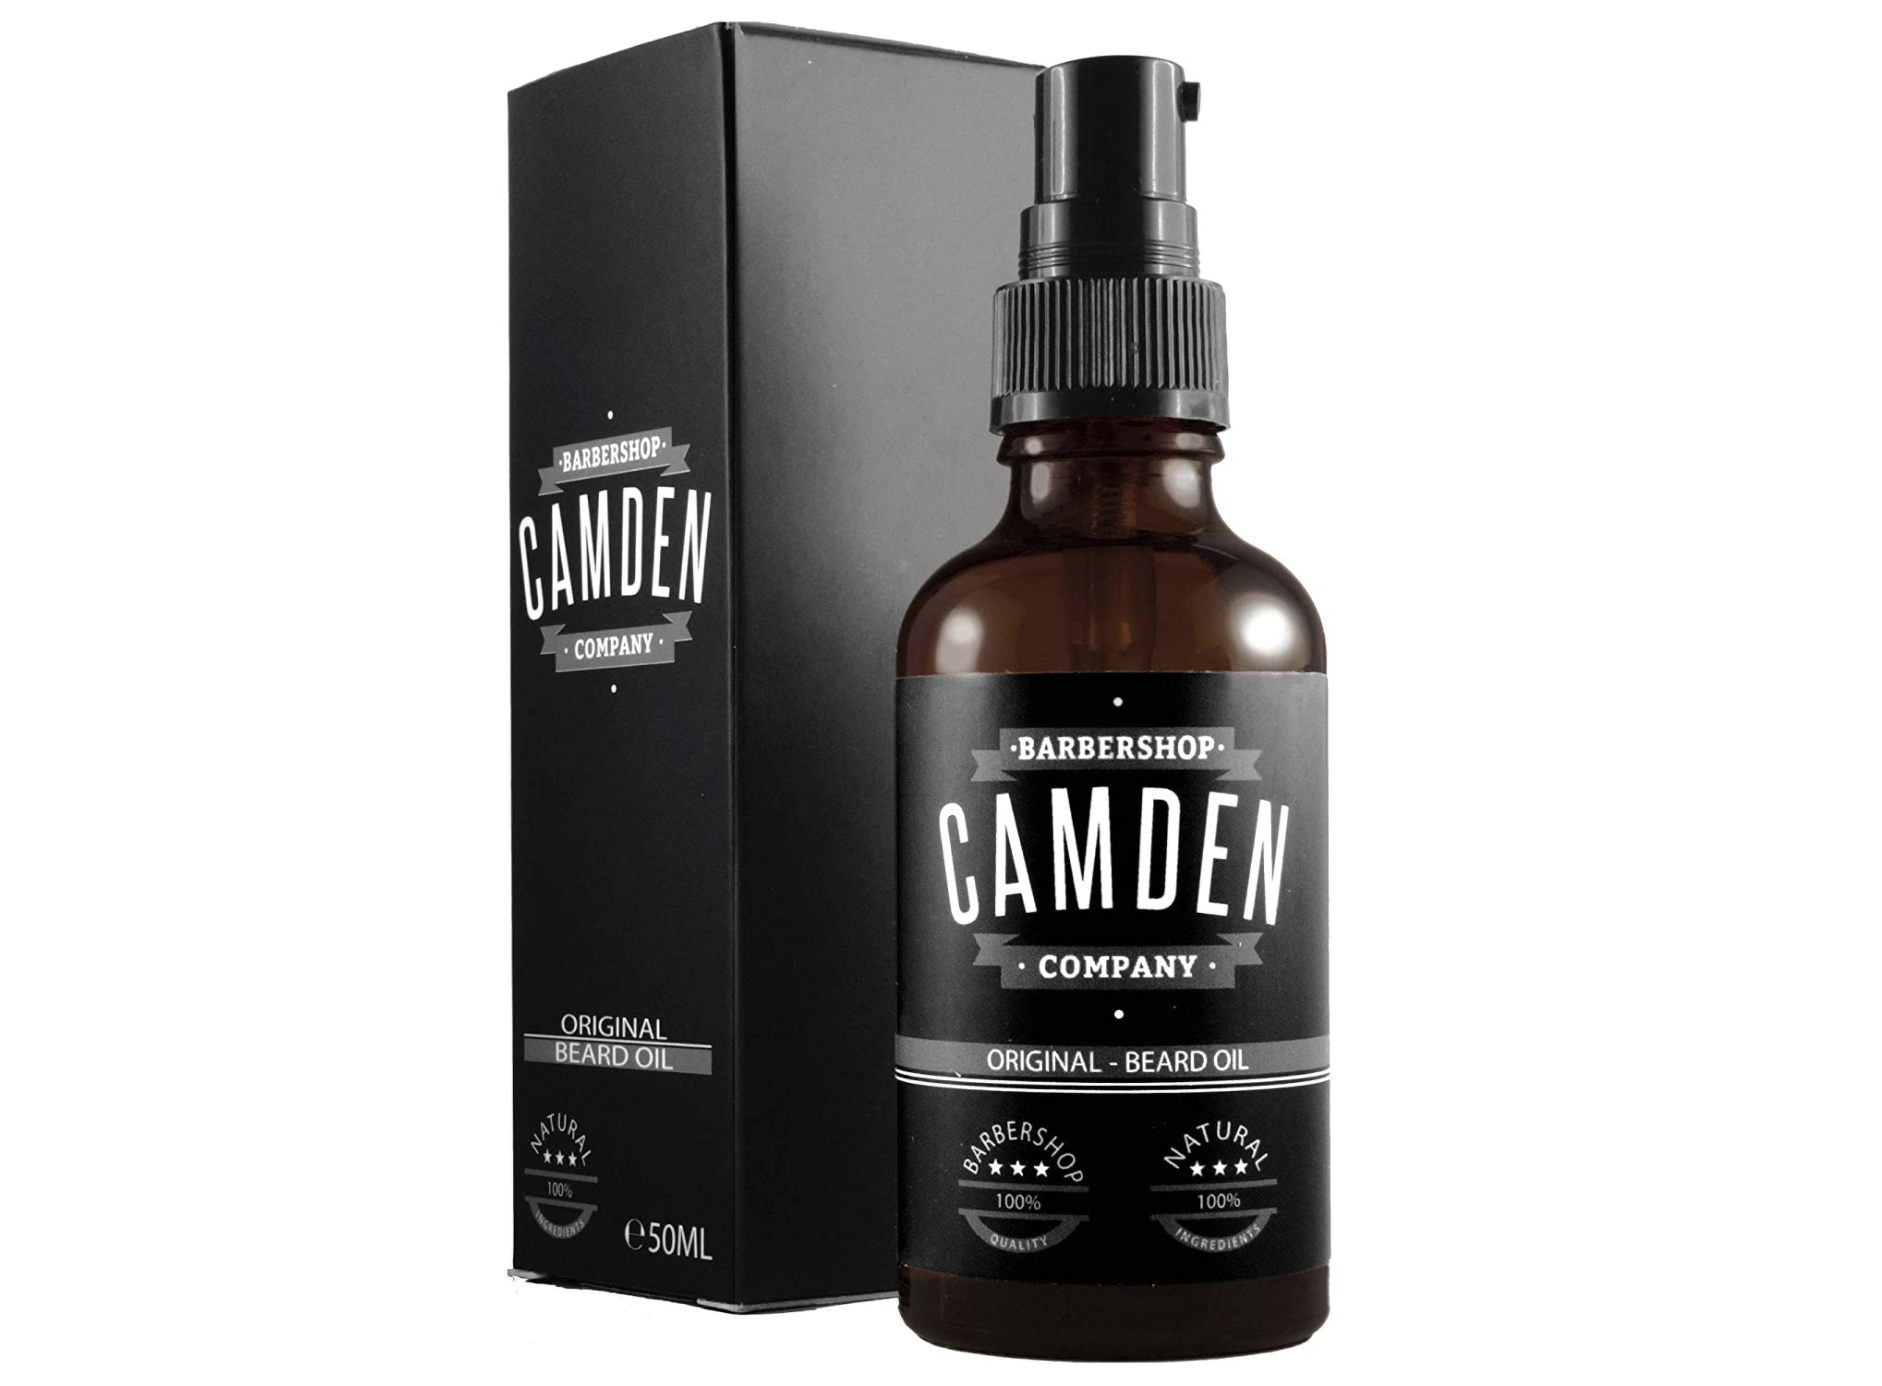 Olio da barba Camden Barbershop Company